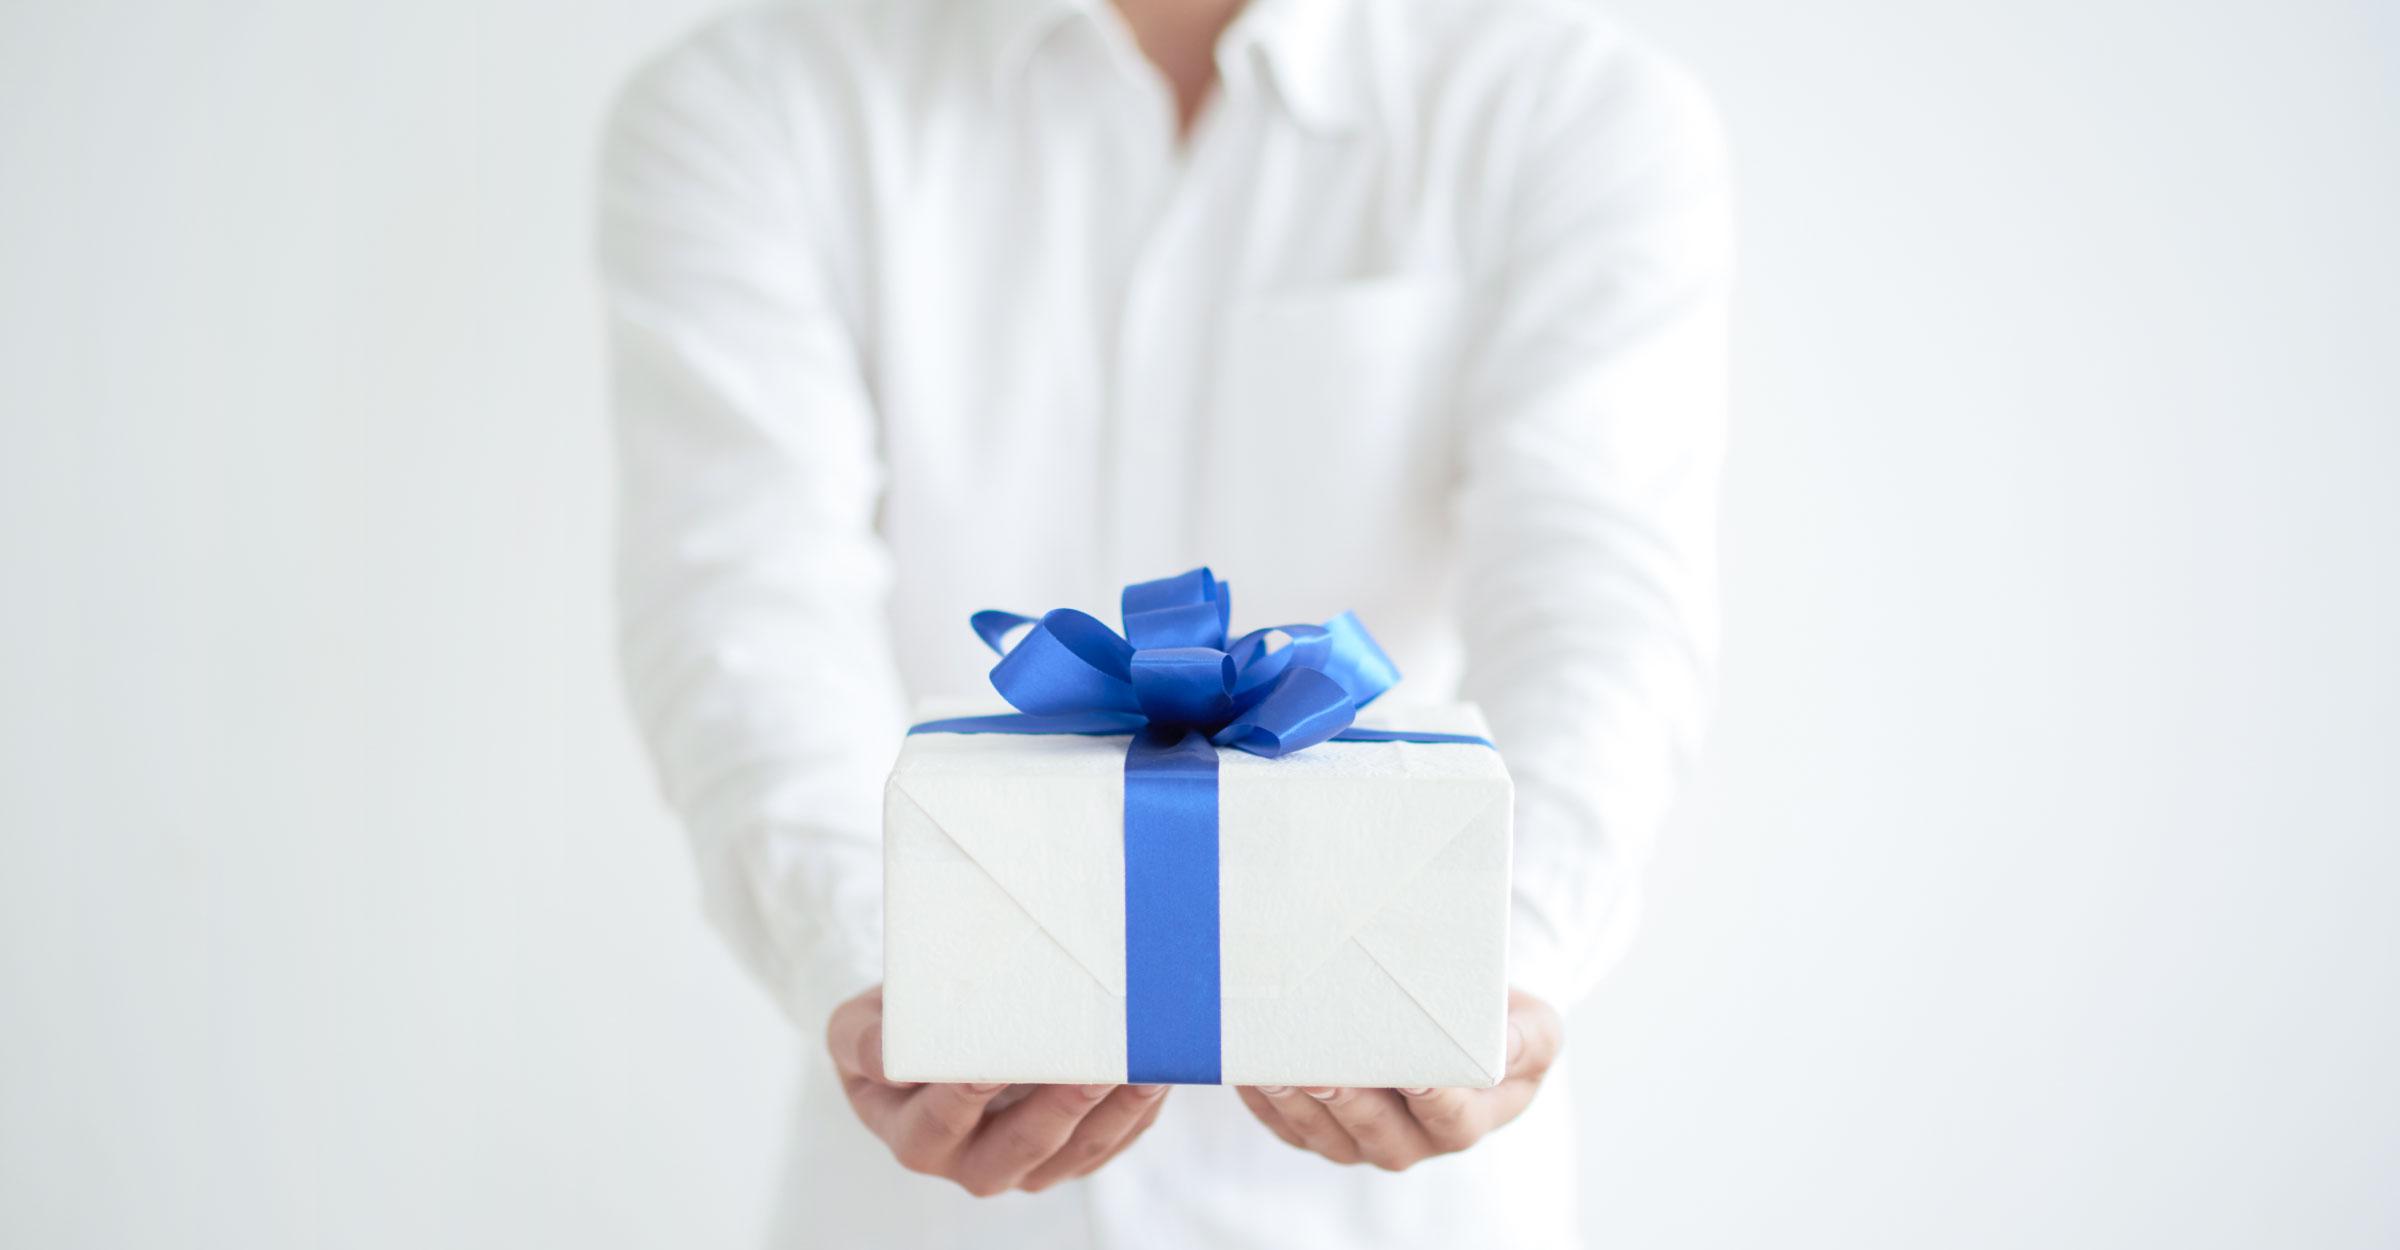 TADA-Membantu-Kamu-Memberikan-Reward-Secara-Terukur-untuk-Karyawan,-Klien,-dan-Partner-1